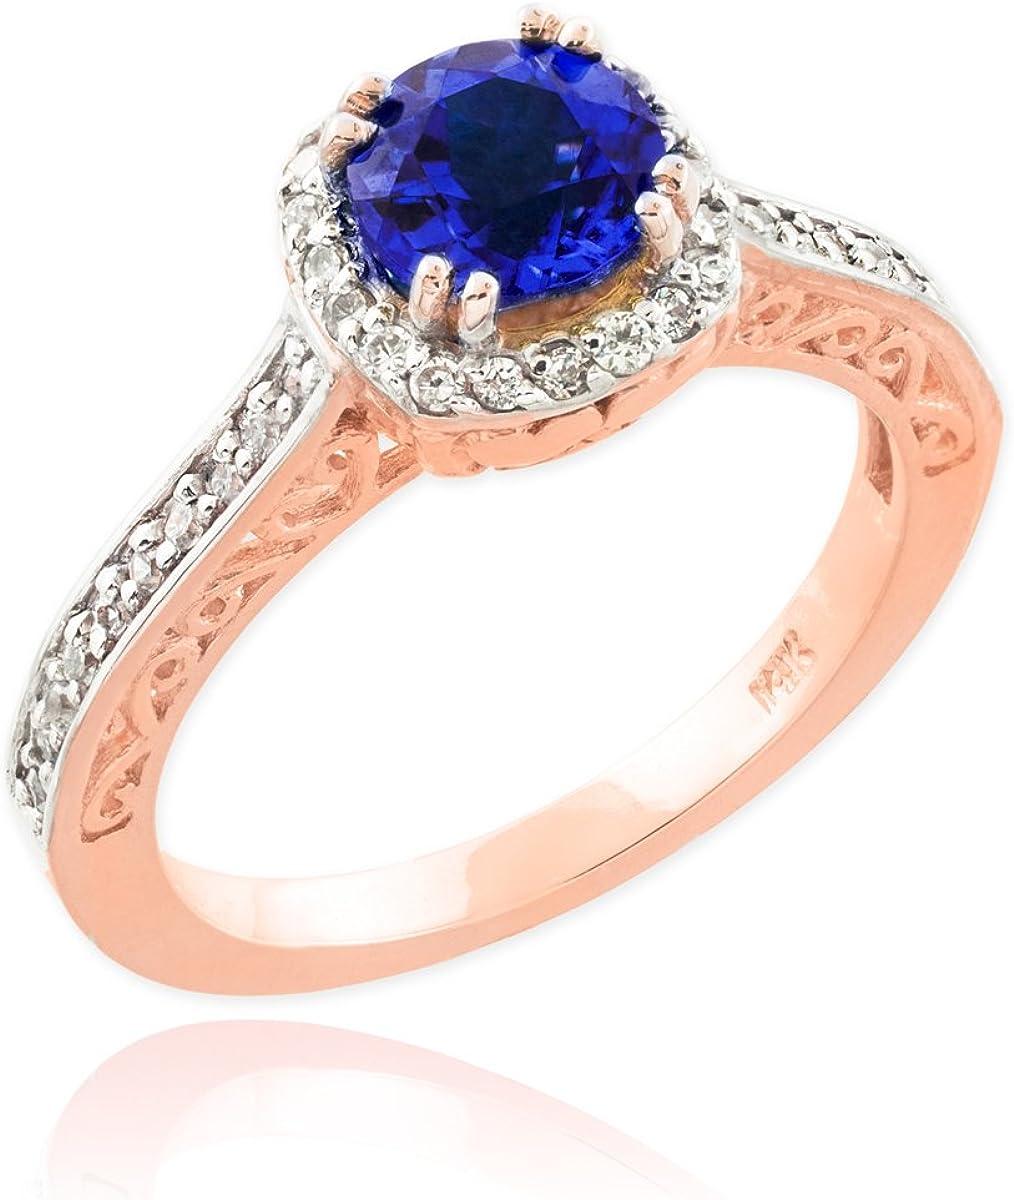 10k Rose Gold Diamond Halo September Birthstone Band Blue Sapphire Engagement Ring (Size 7)